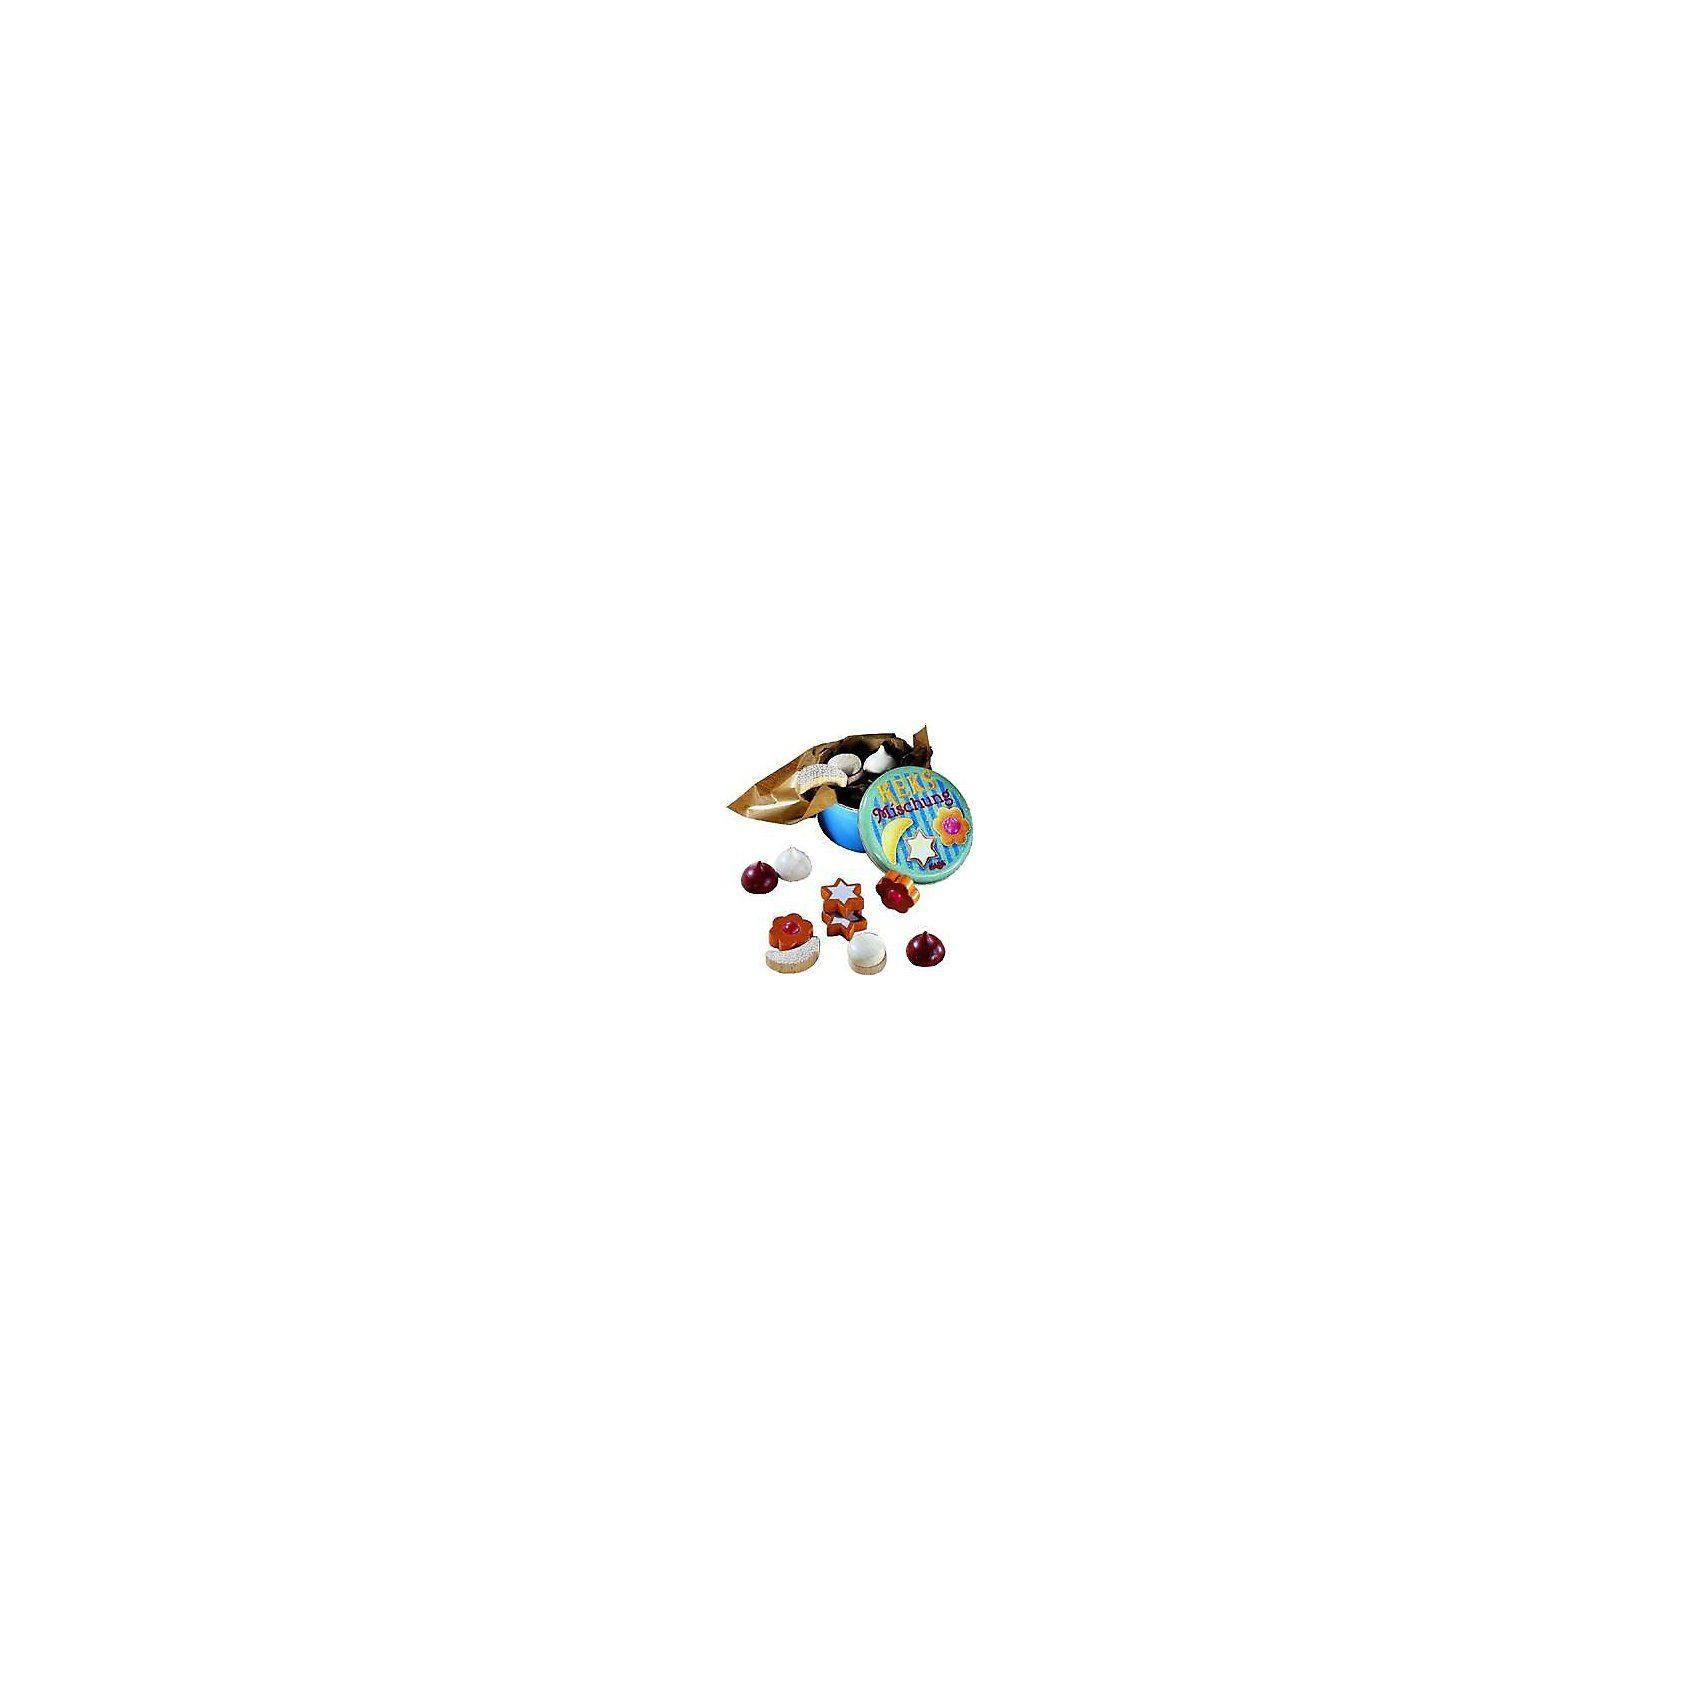 Haba 1407 Keksdose Spiellebensmittel